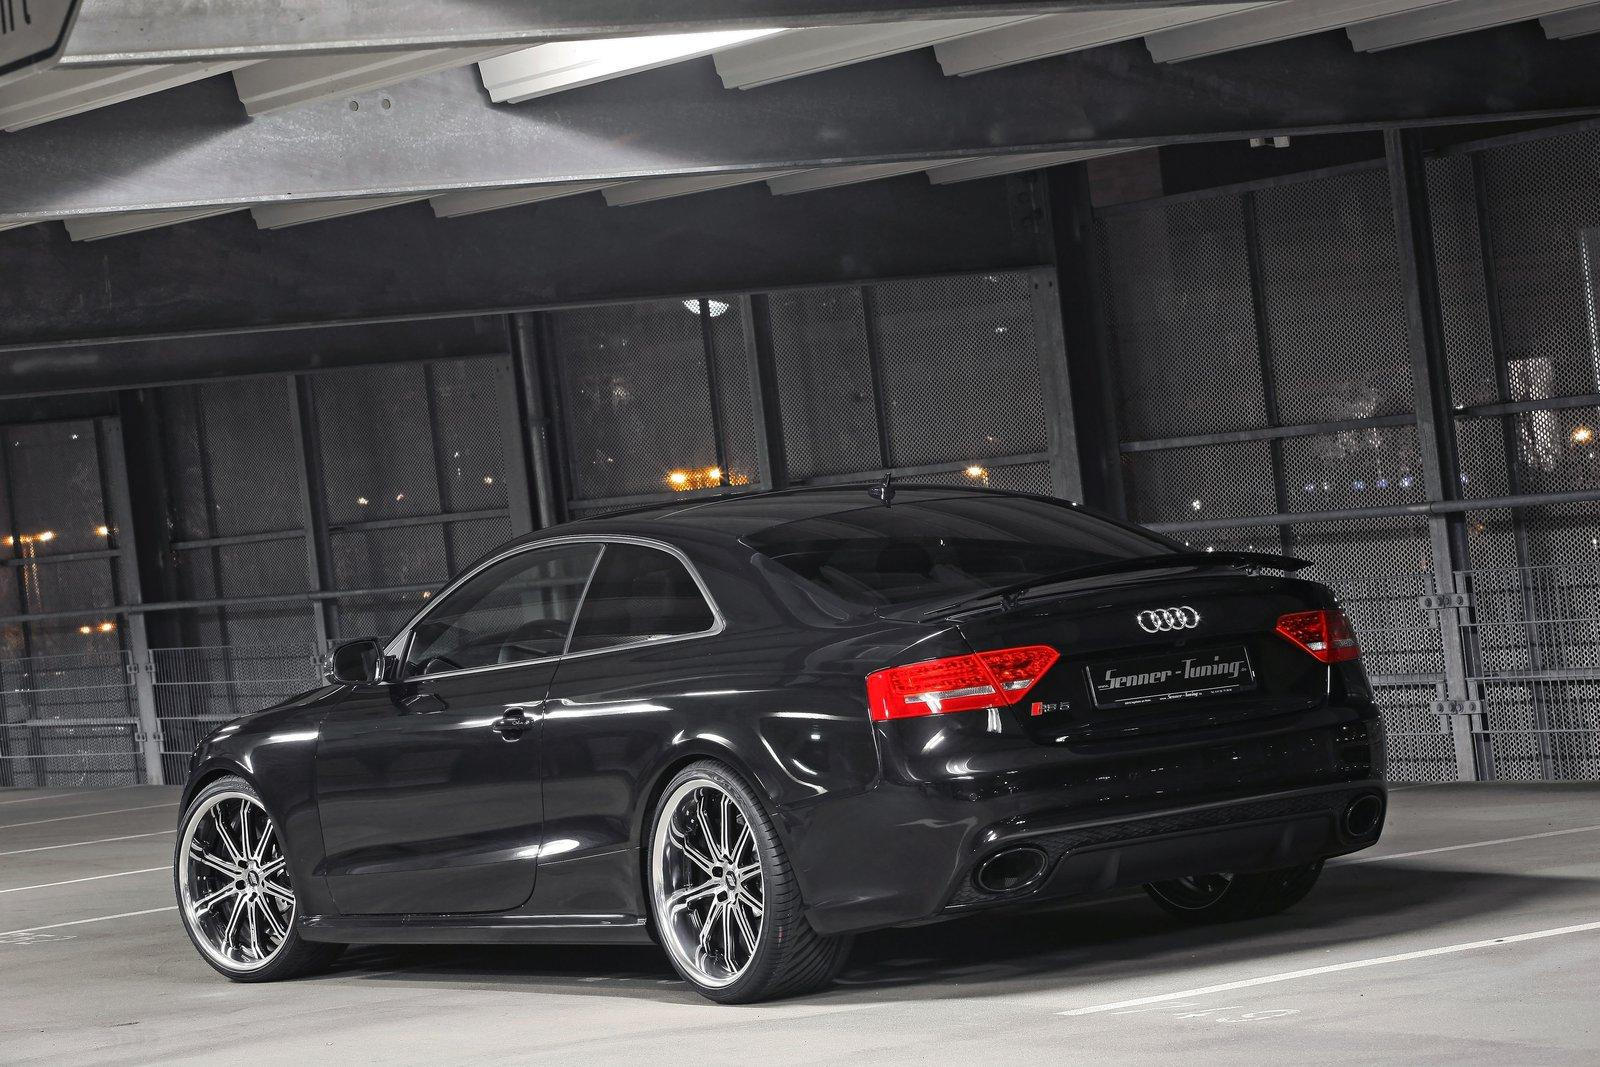 Senner Tuning releases 506-hp Audi RS5 | quattroholic.com